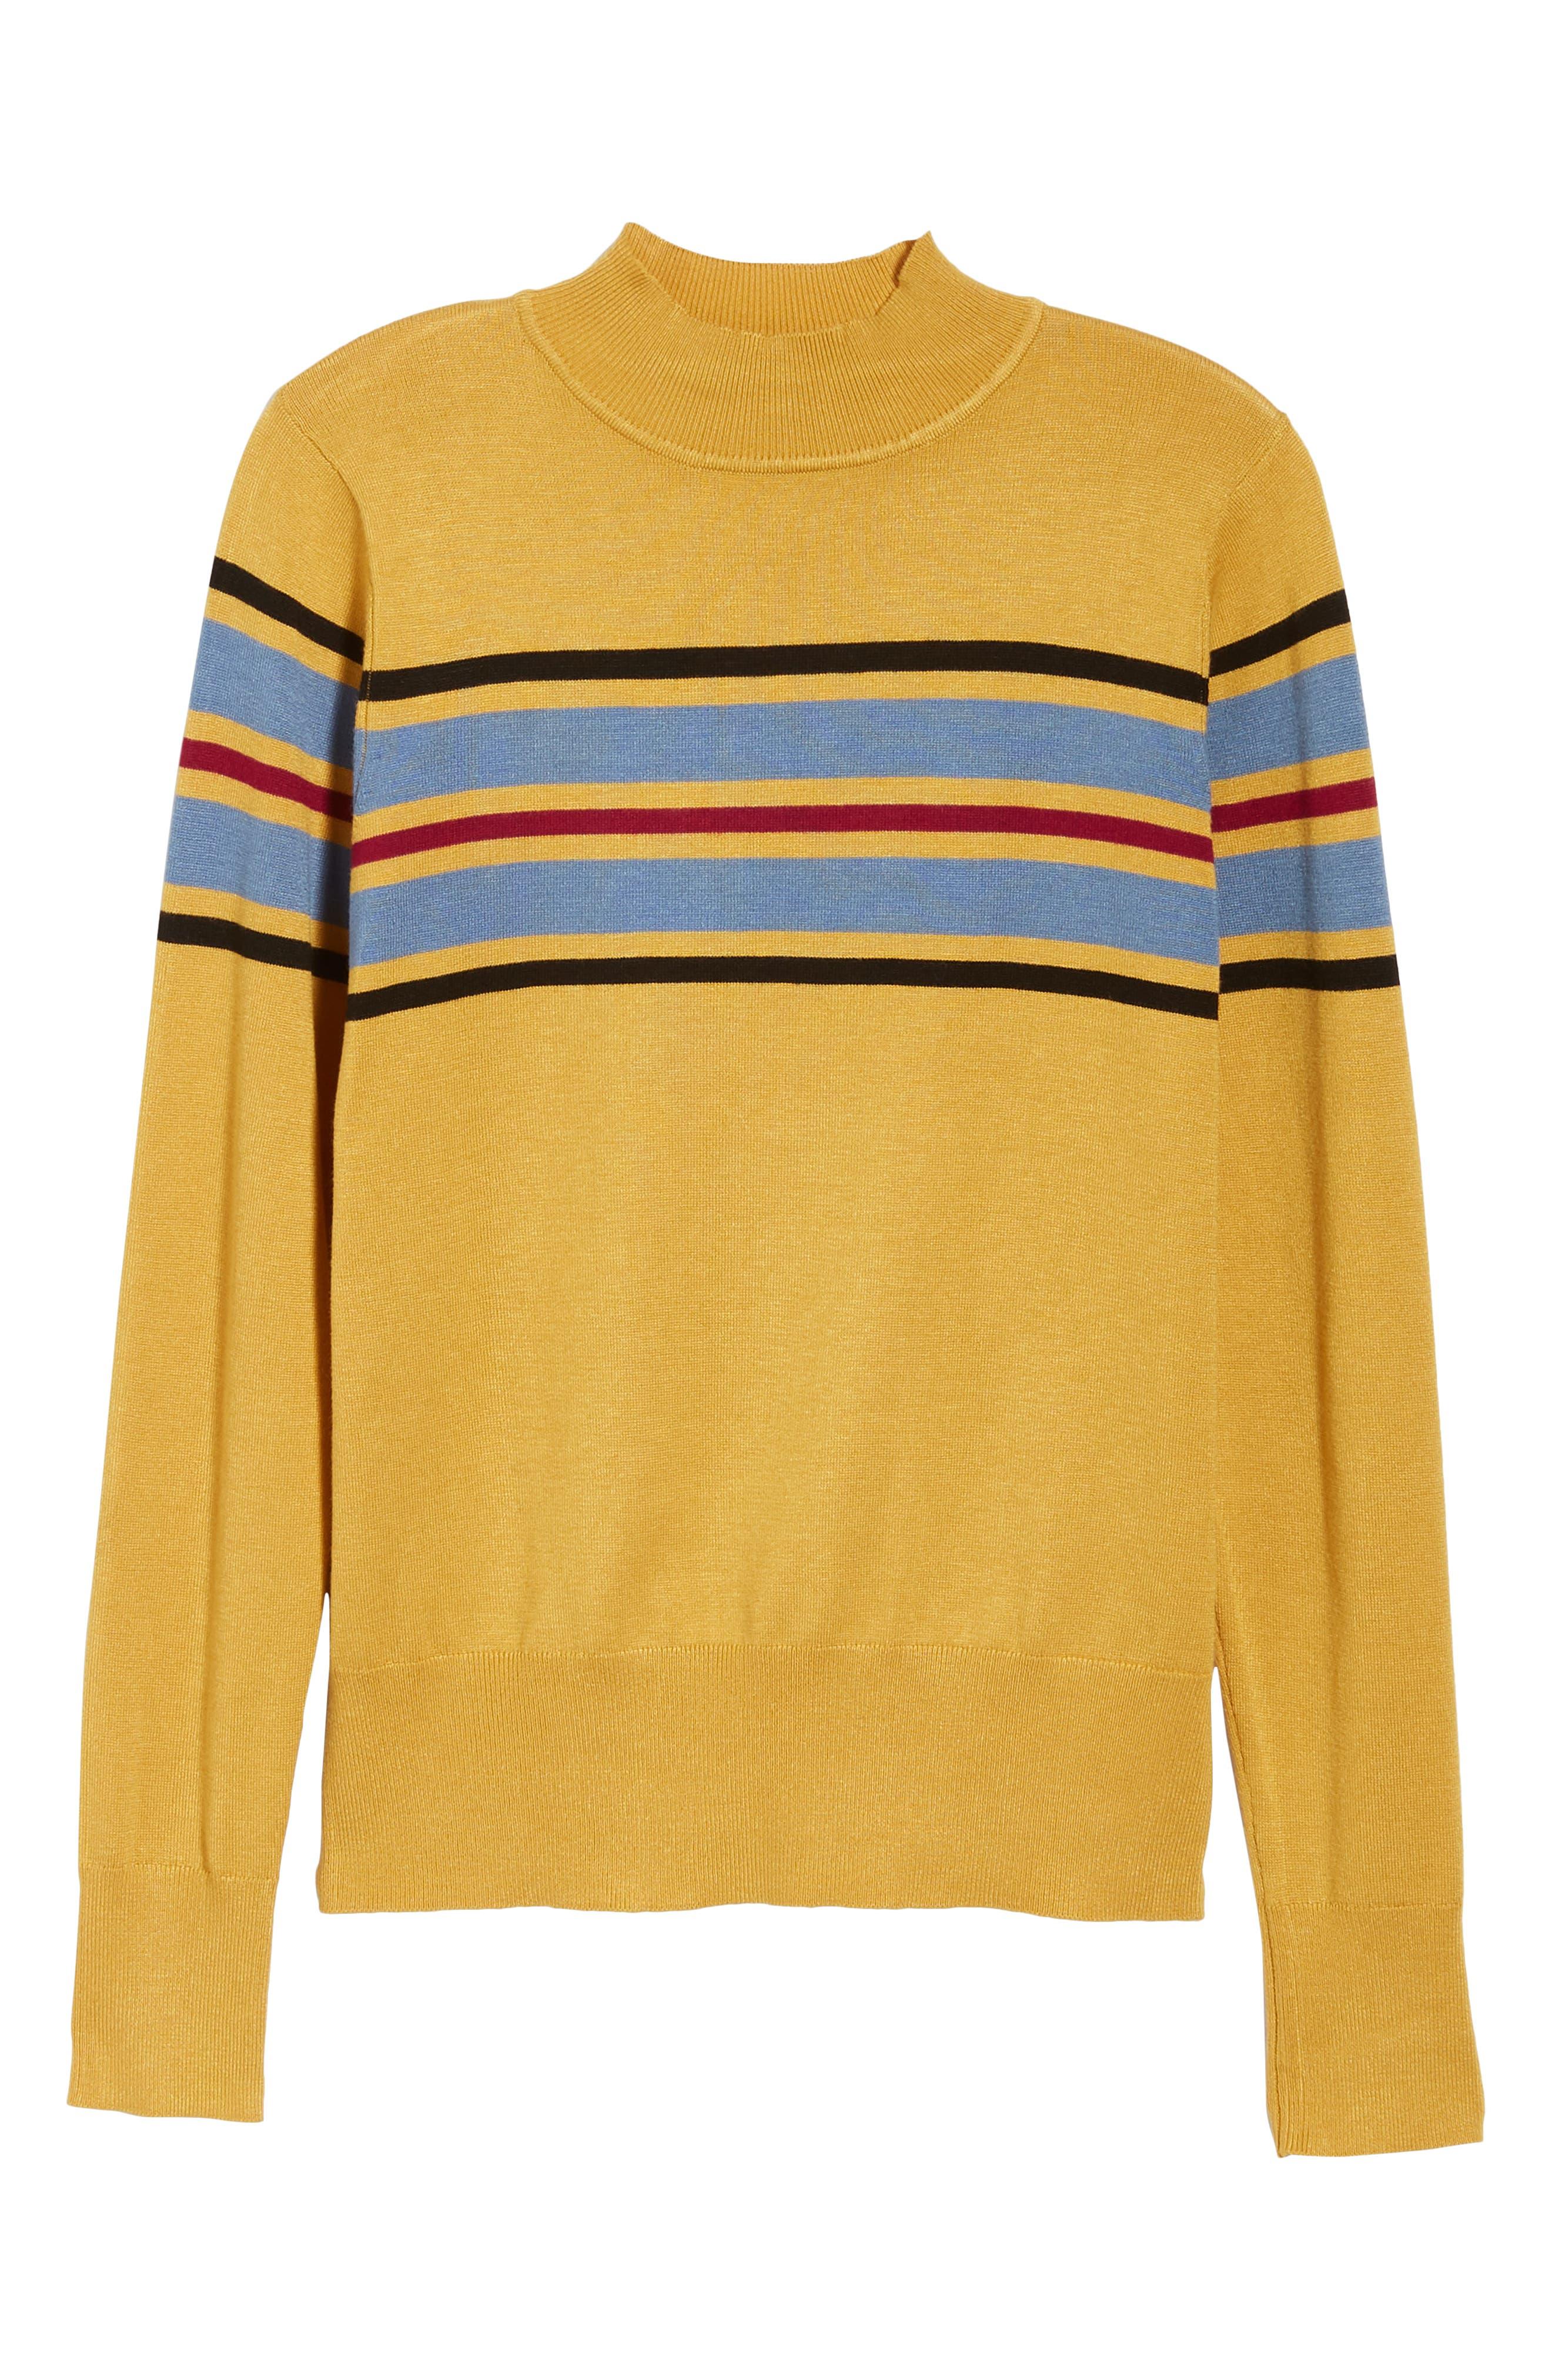 Skivvy Stripe Sweater,                             Alternate thumbnail 6, color,                             MUSTARD